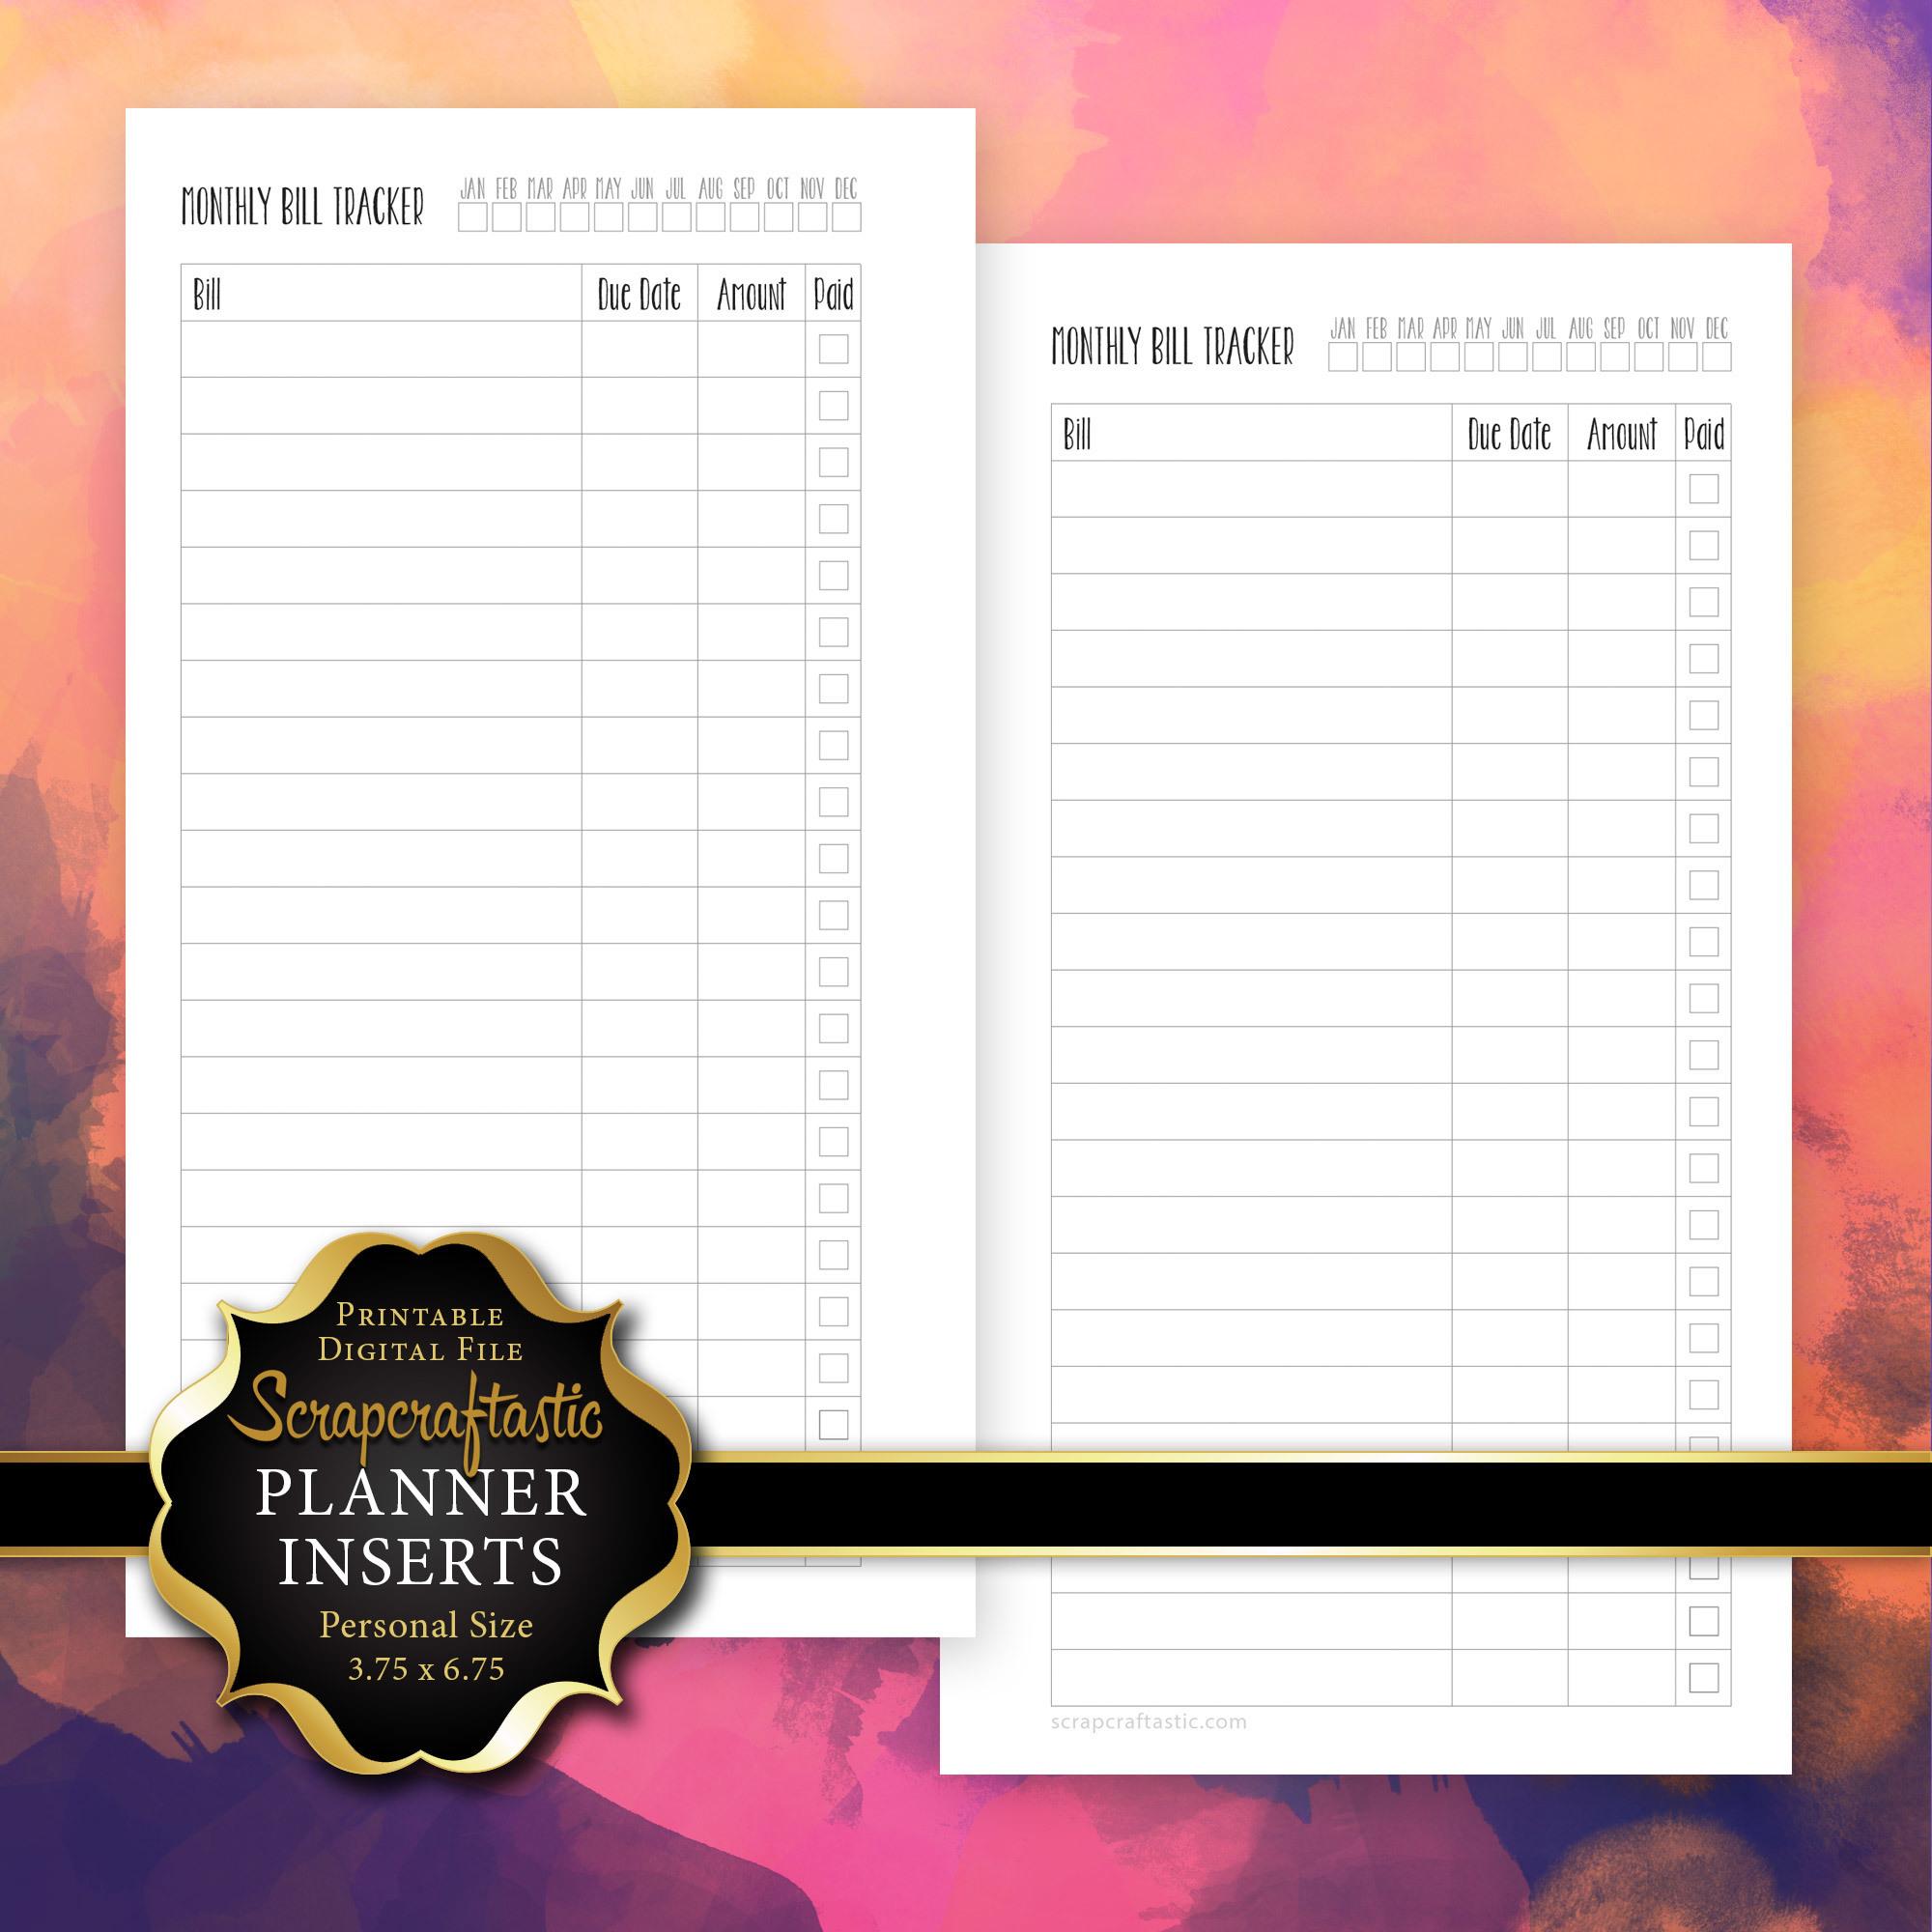 Free Personal Size Bill Tracker Printable Planner Inserts dbr_billtrackerV2